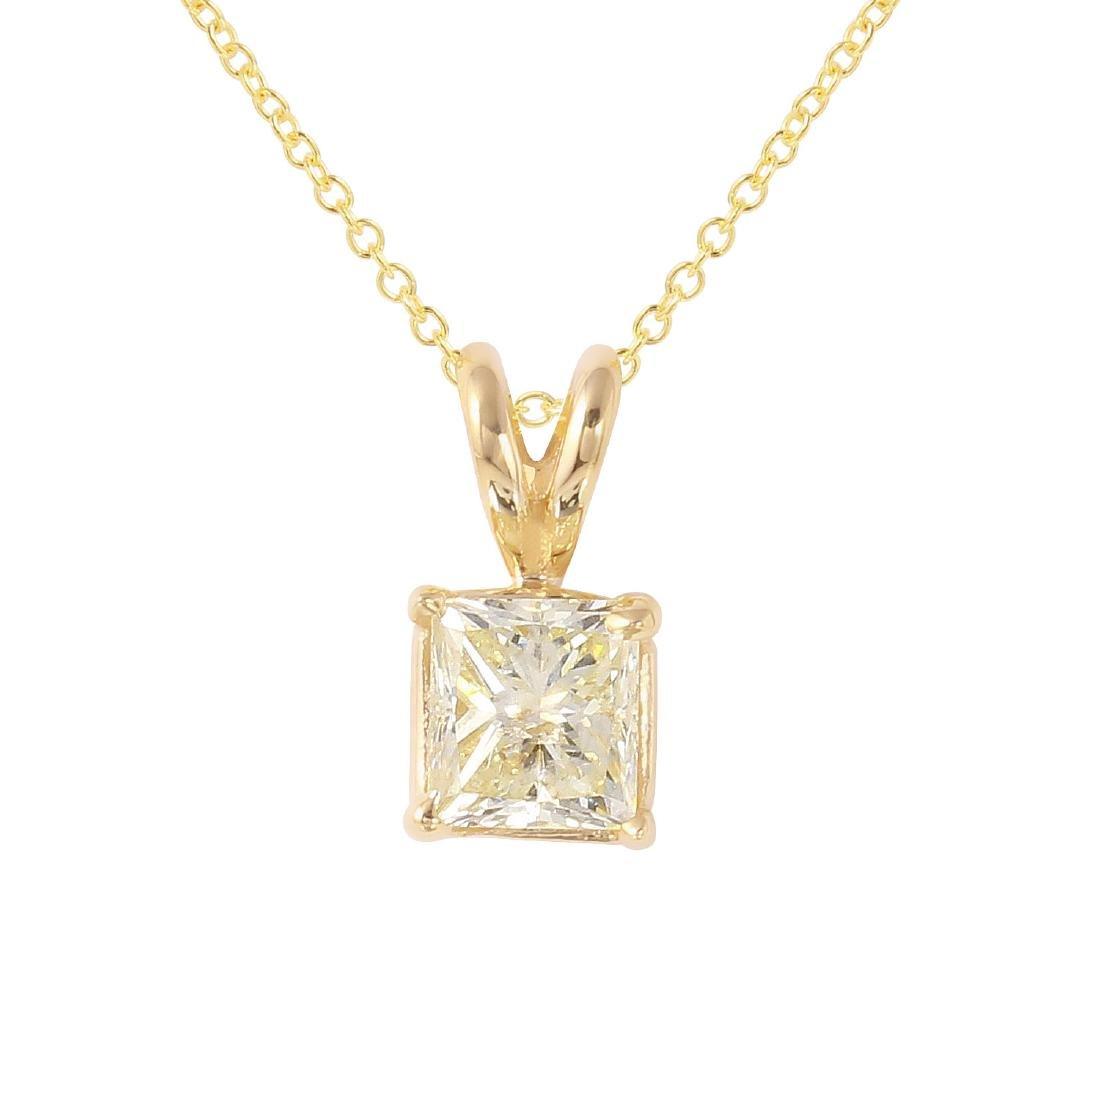 14KT Yellow Gold Diamond Pendant & Chain